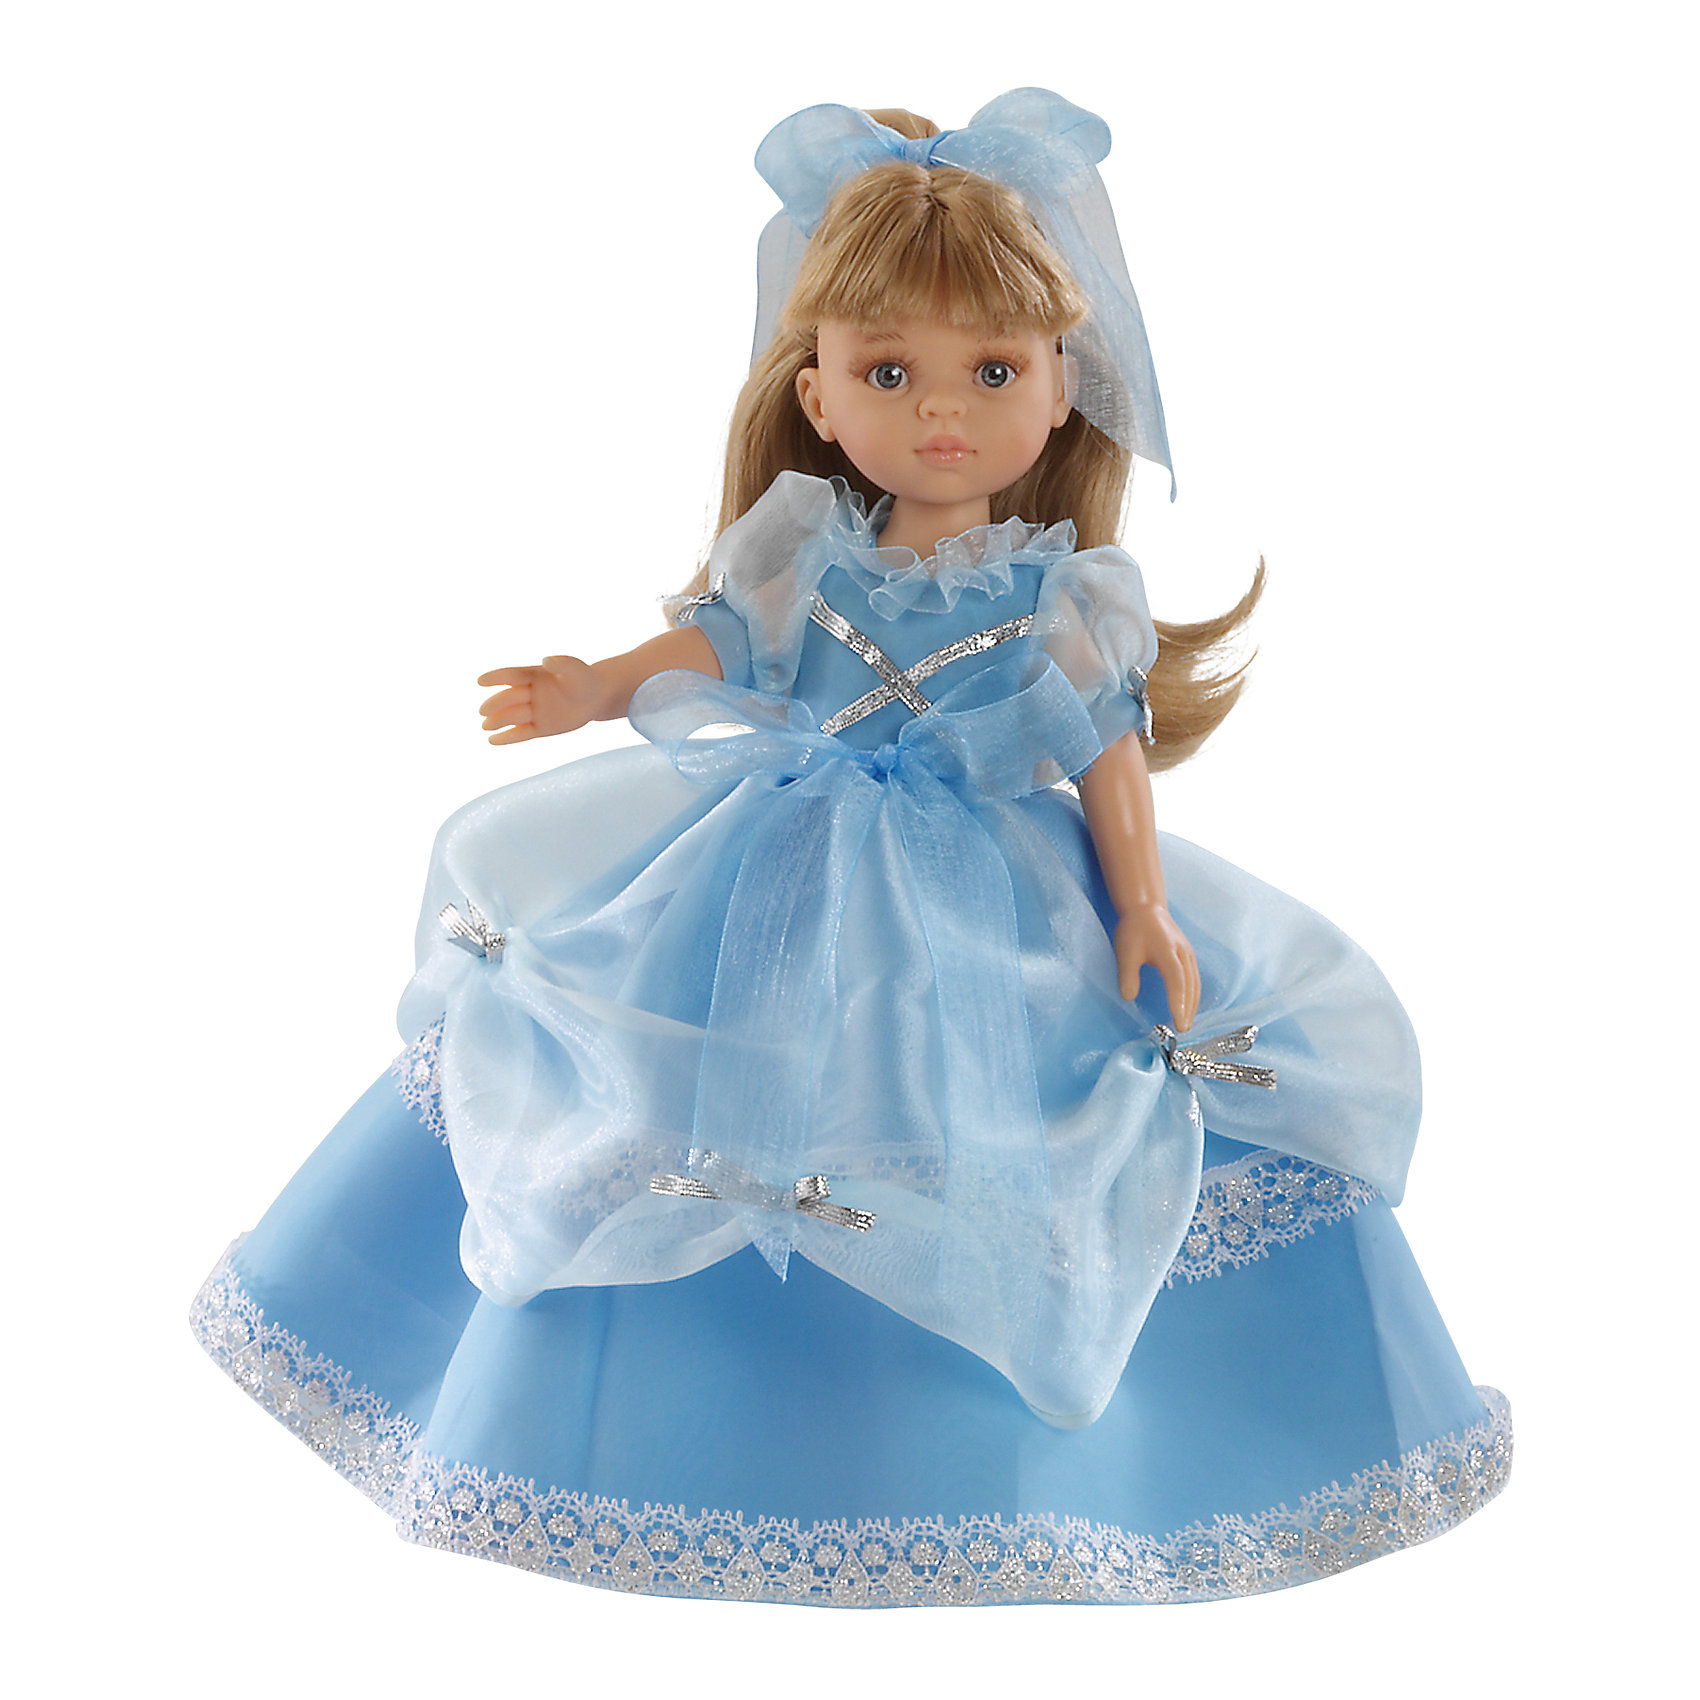 Paola Reina Кукла Карла принцесса, 32см, Paola Reina paola reina кукла клэр 32 см paola reina